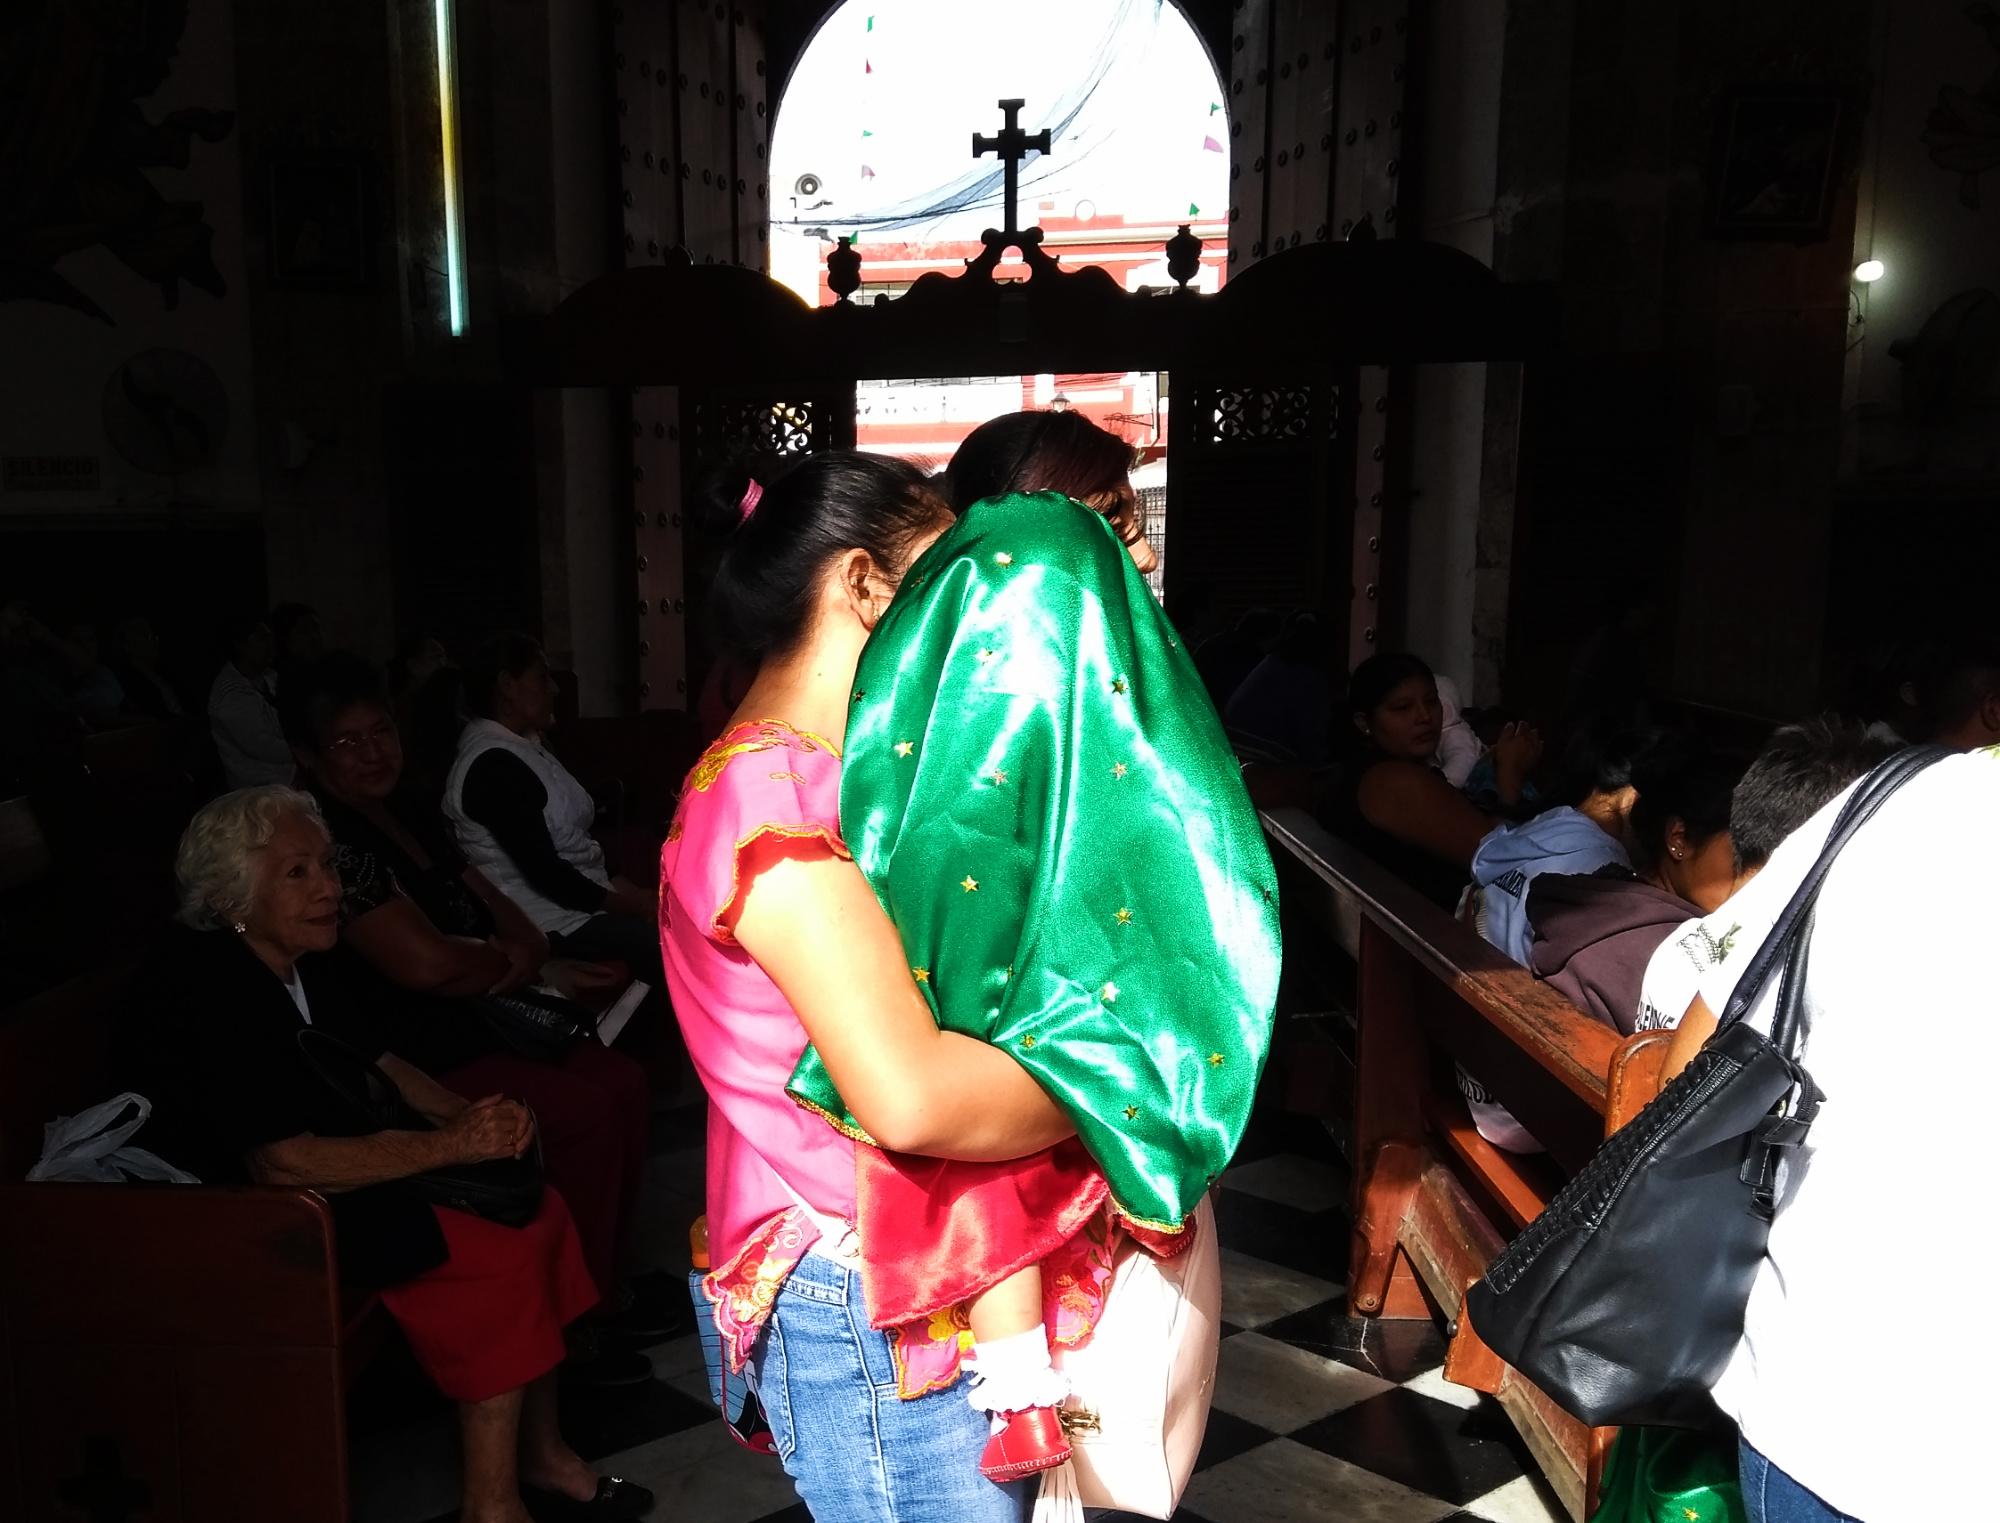 Inicia en Mérida <i>fiesta mexicana</i> de la fe: adoración de la Virgen de Guadalupe